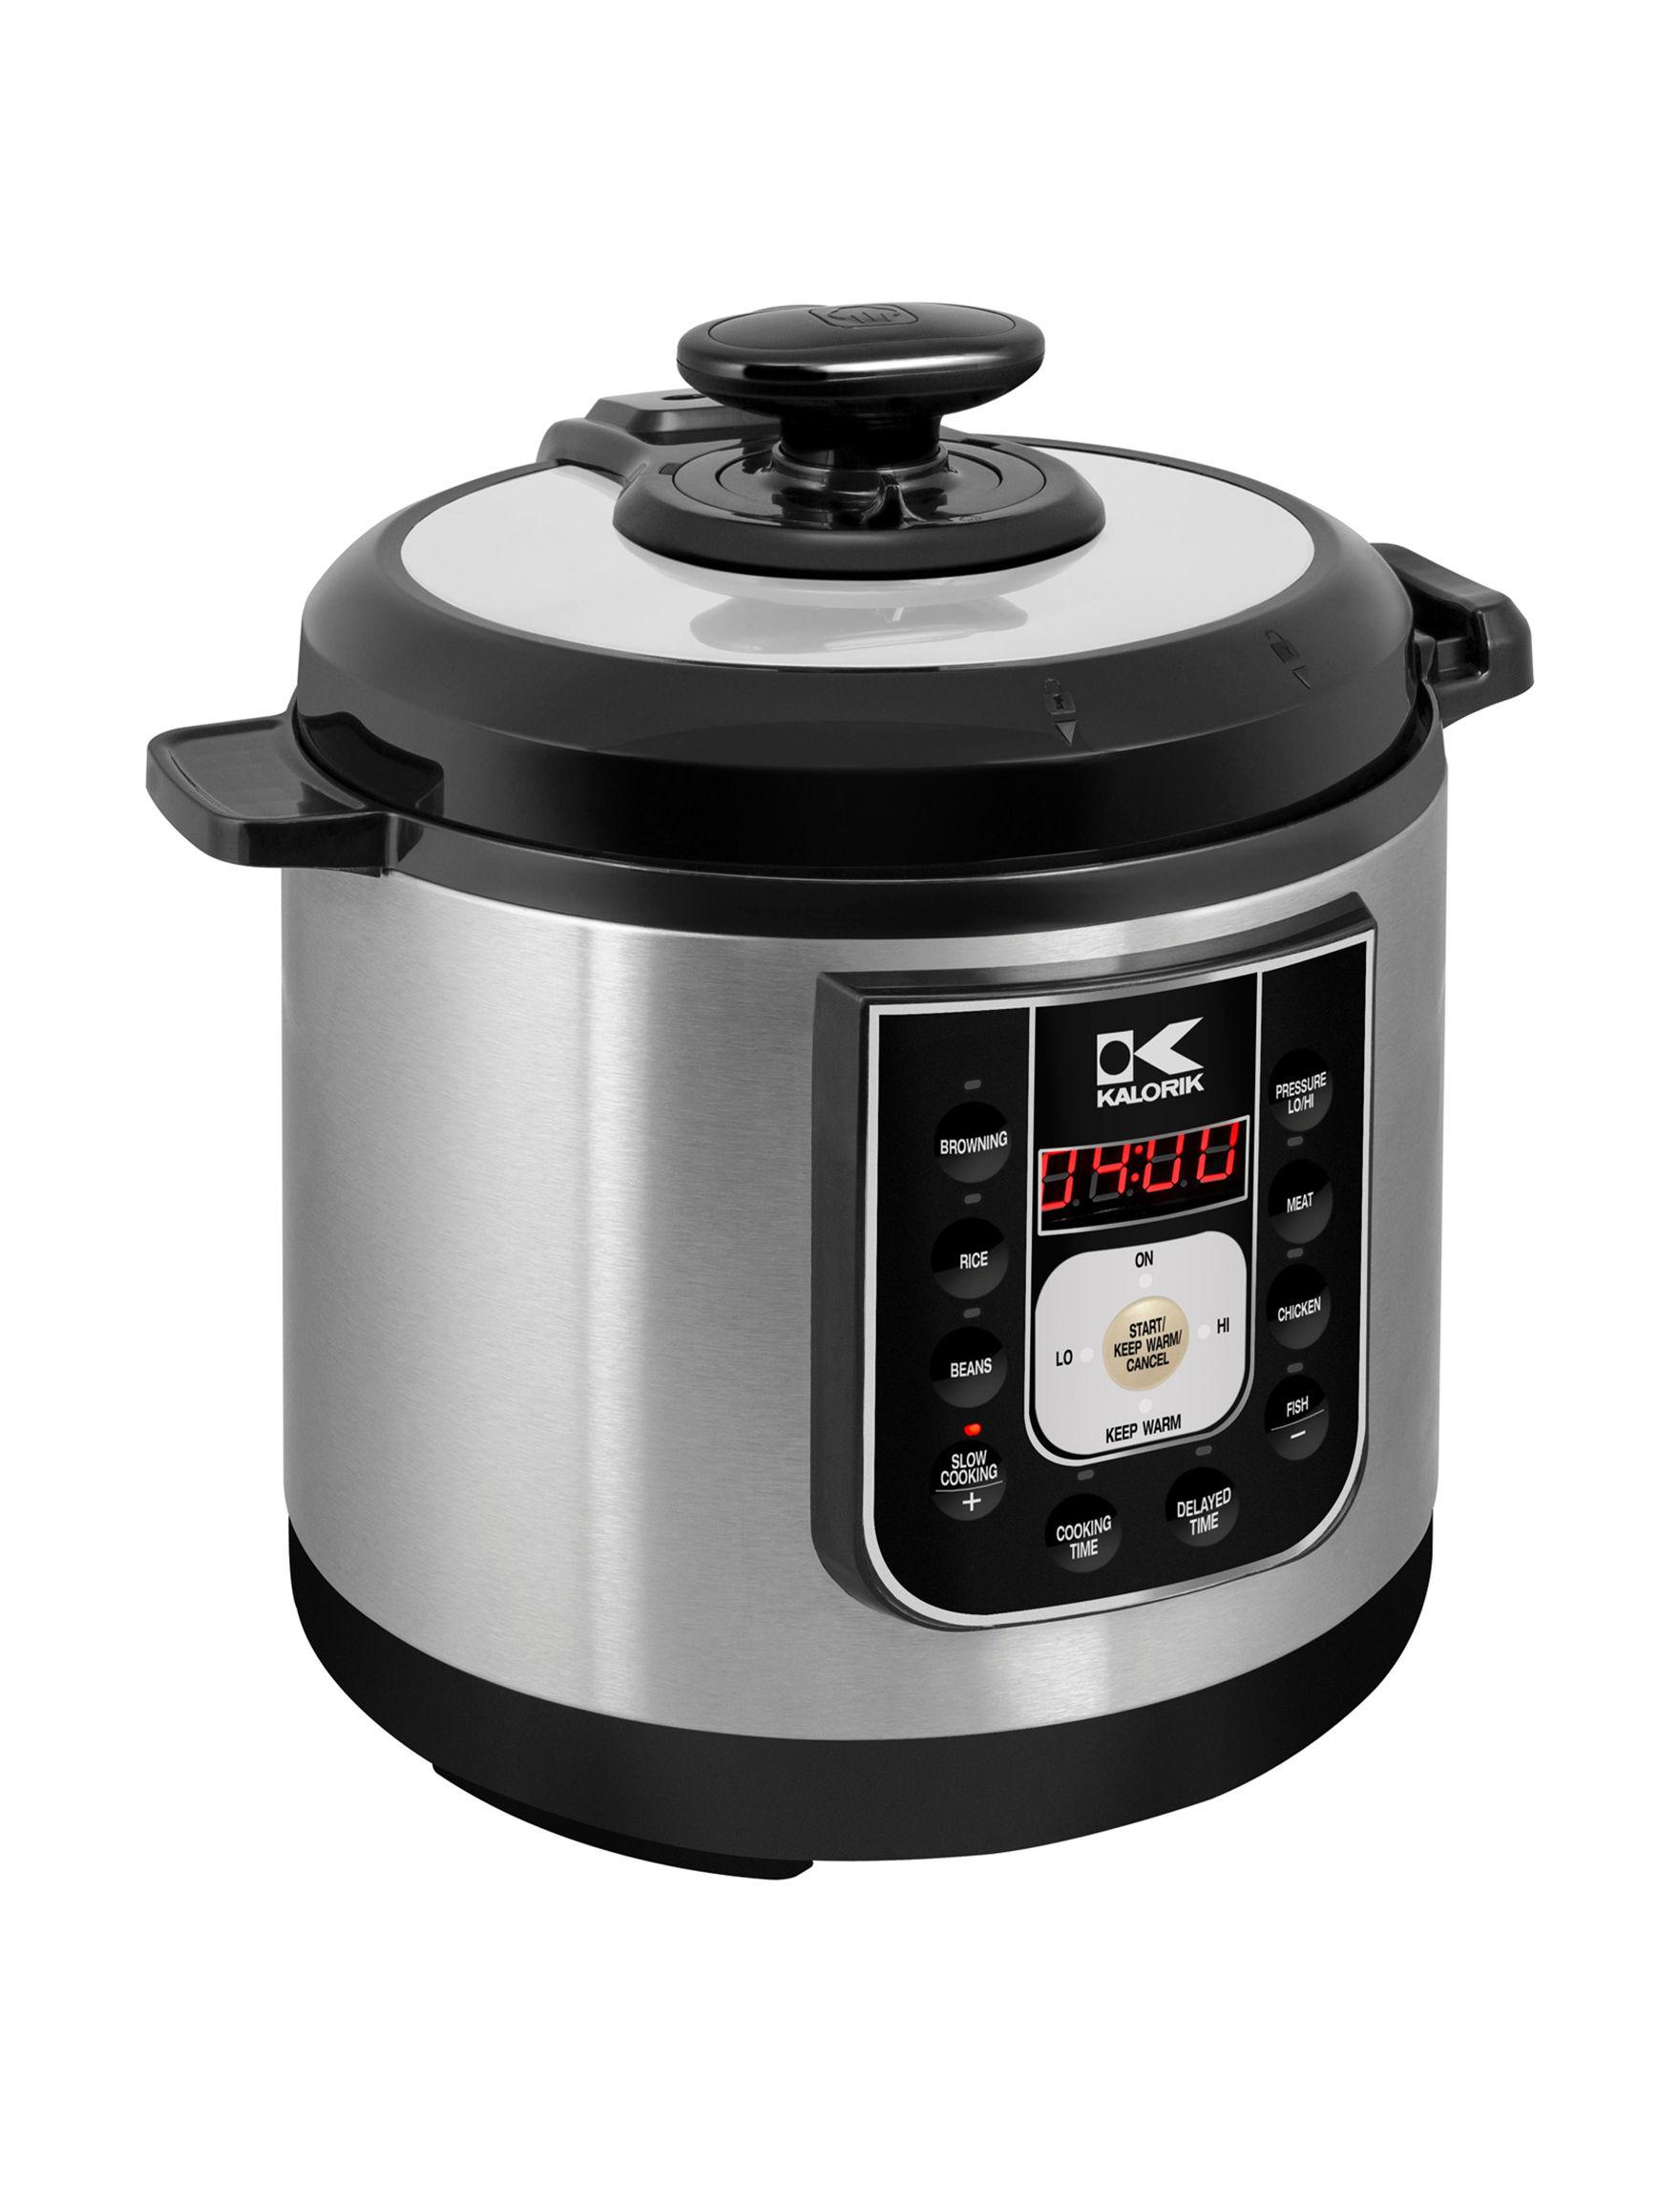 Kalorik Black Pressure Cookers, Rice Cookers & Steamers Kitchen Appliances